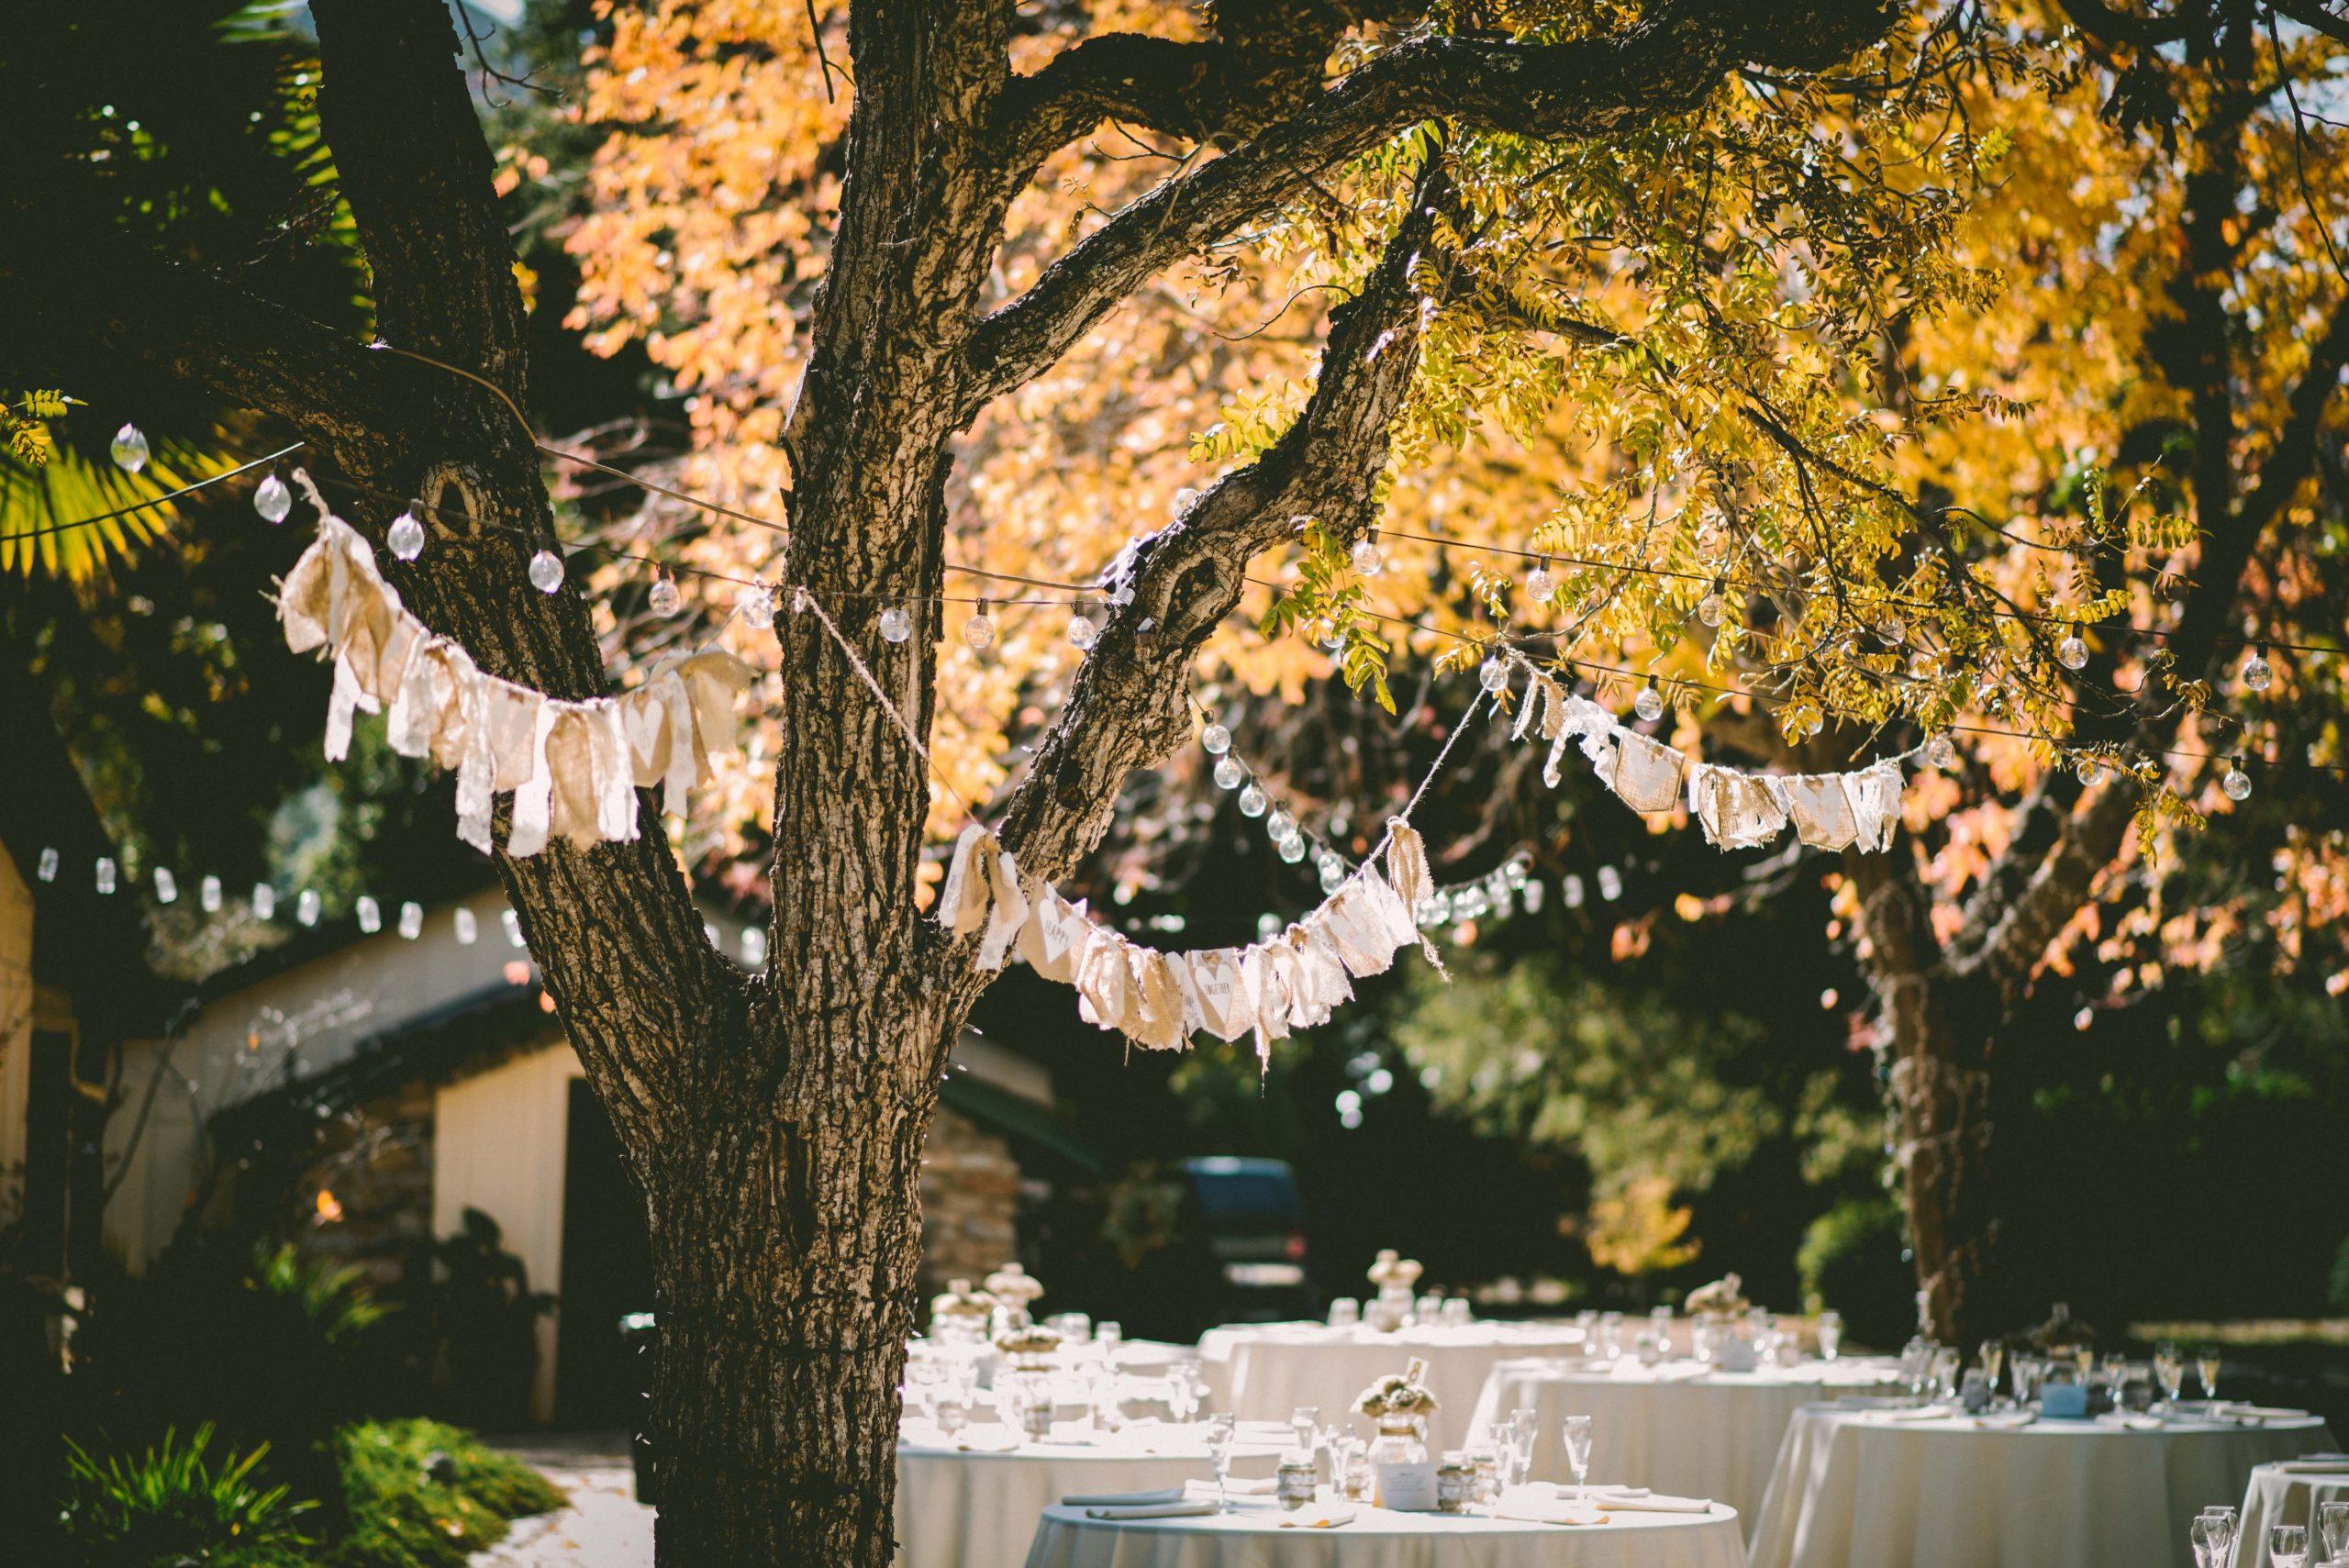 How To Organize A Backyard Wedding